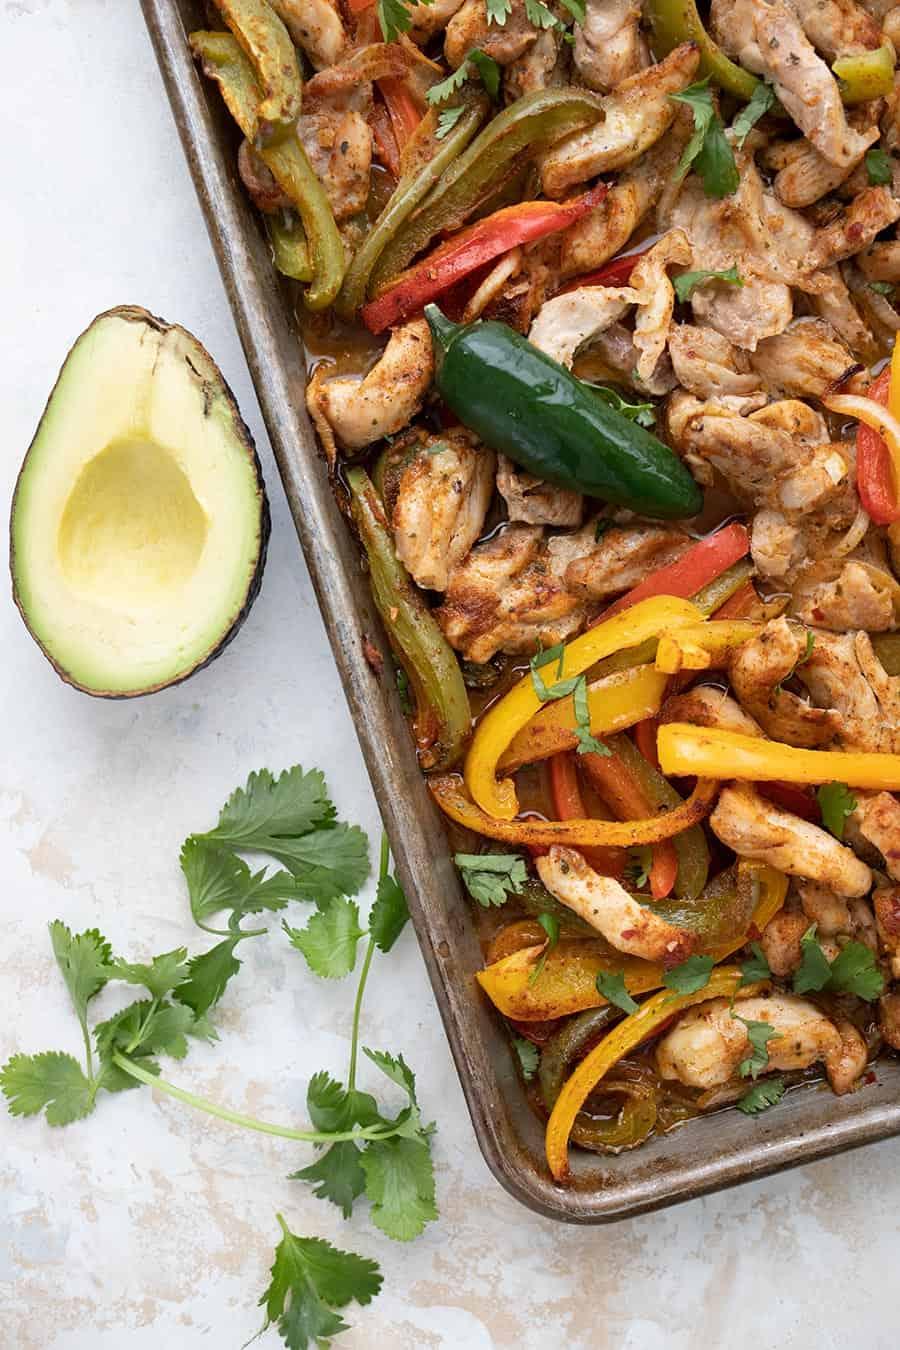 Top down image of sheet pan chicken fajitas with cilantro and avocado beside the pan.